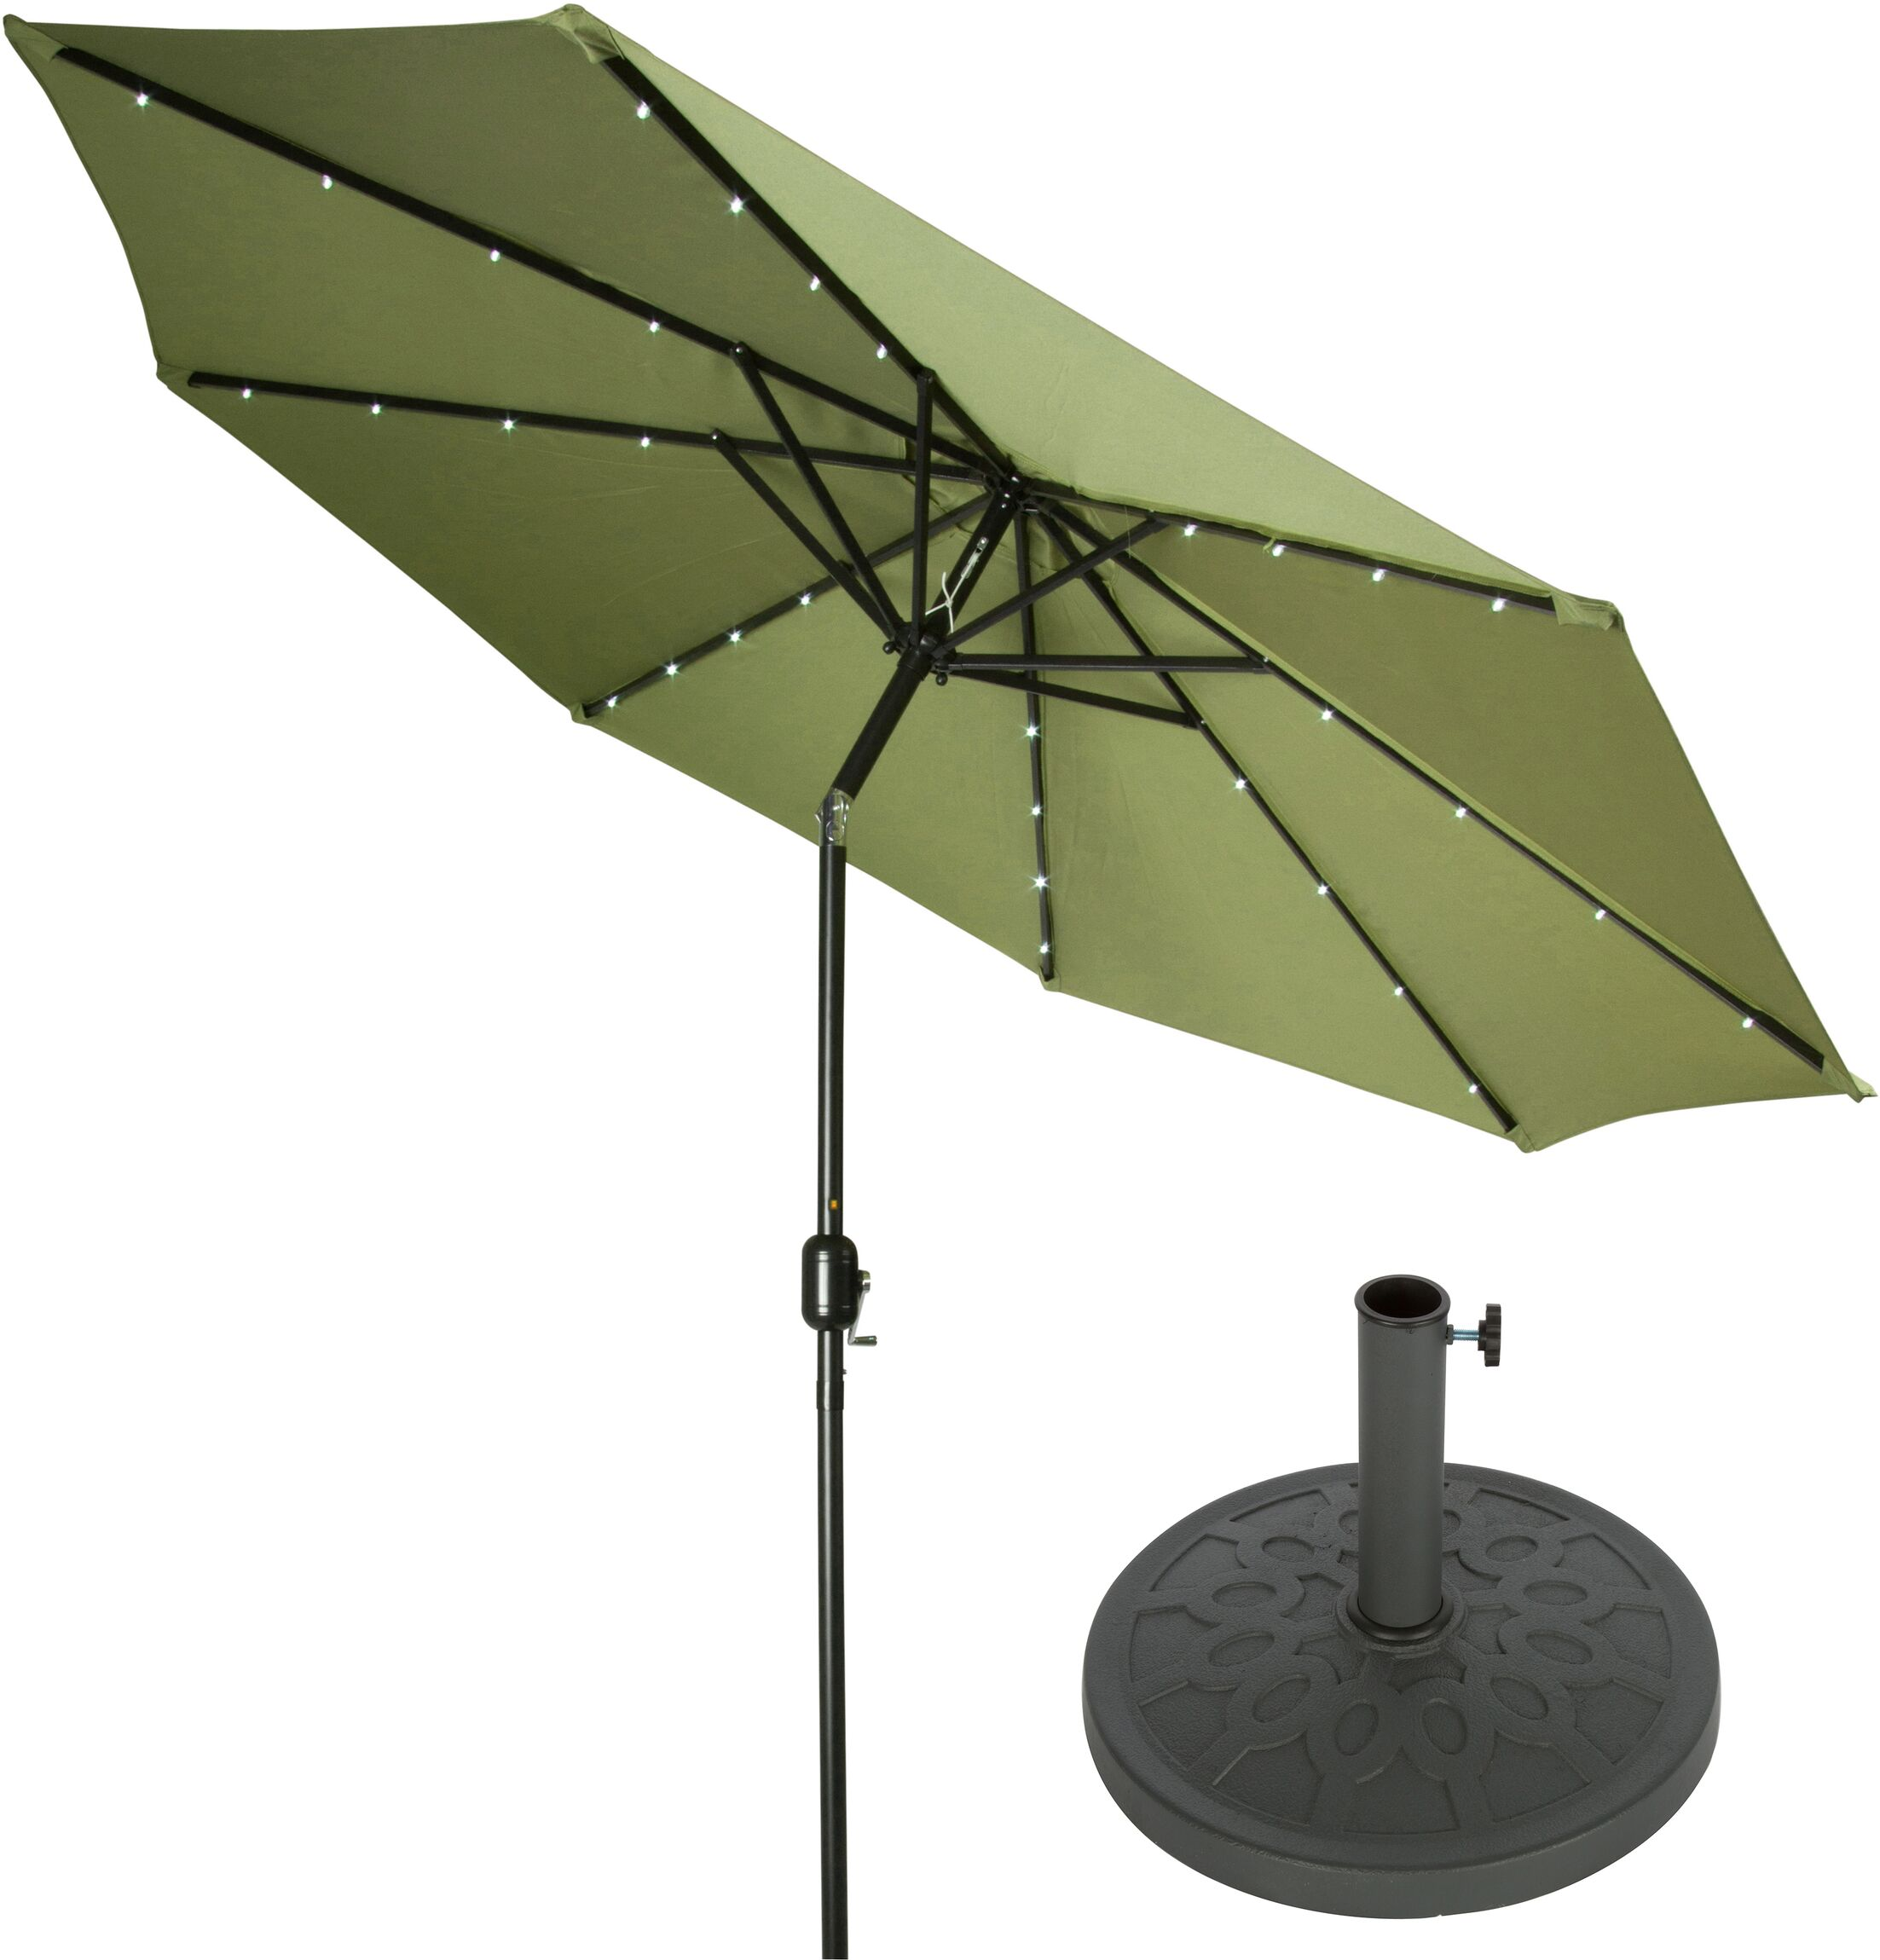 9' Lighted Umbrella Color: Light Green